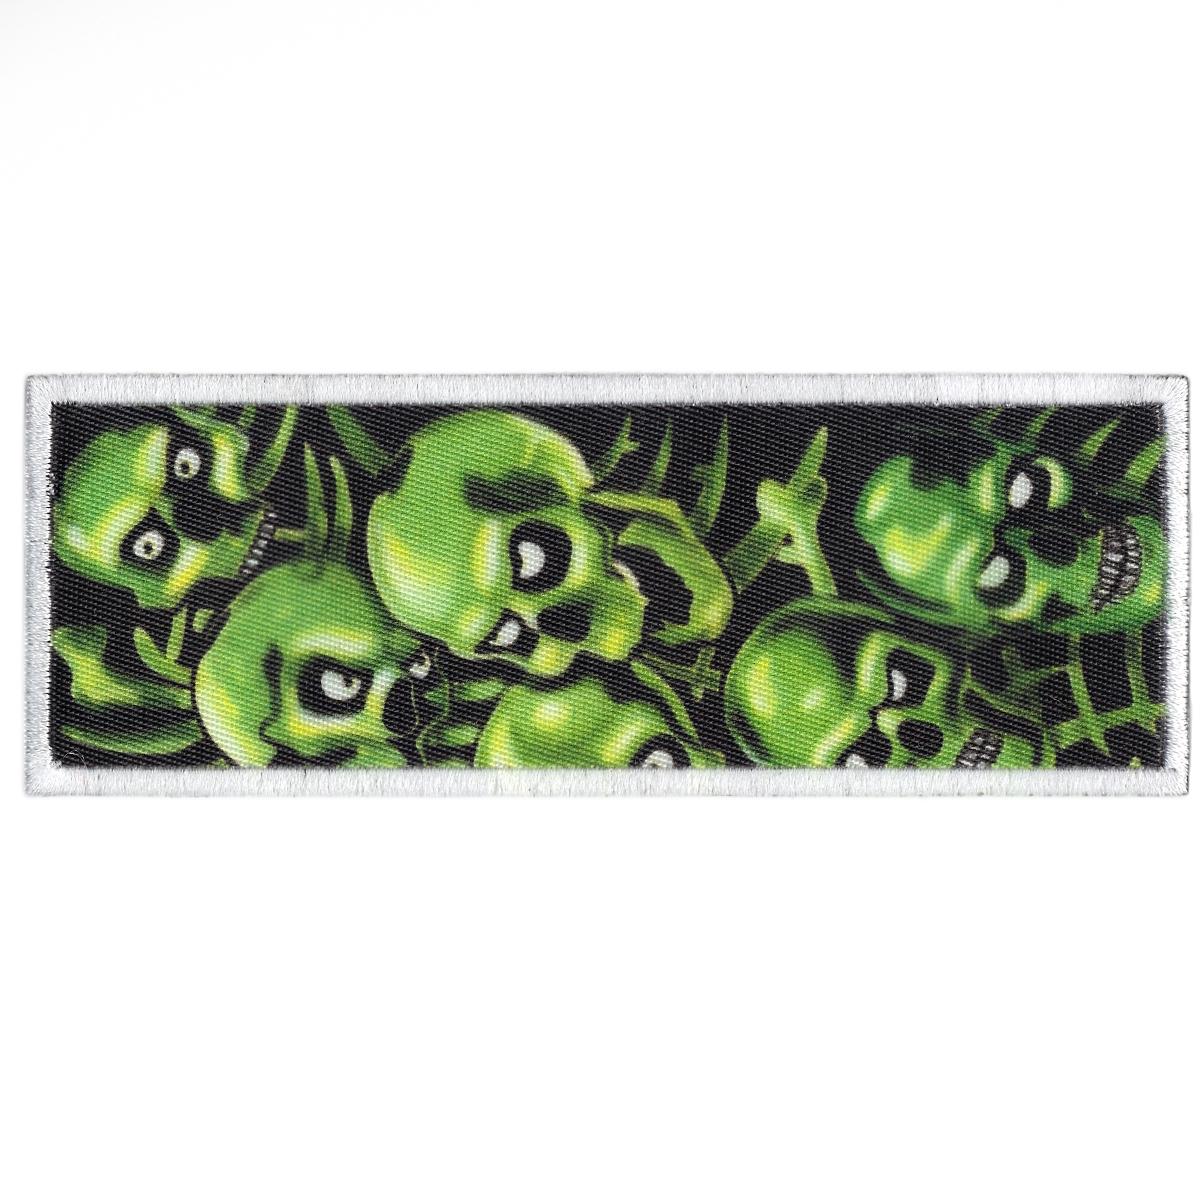 Green Skull Pile Box Box Logo Print Iron On Patch